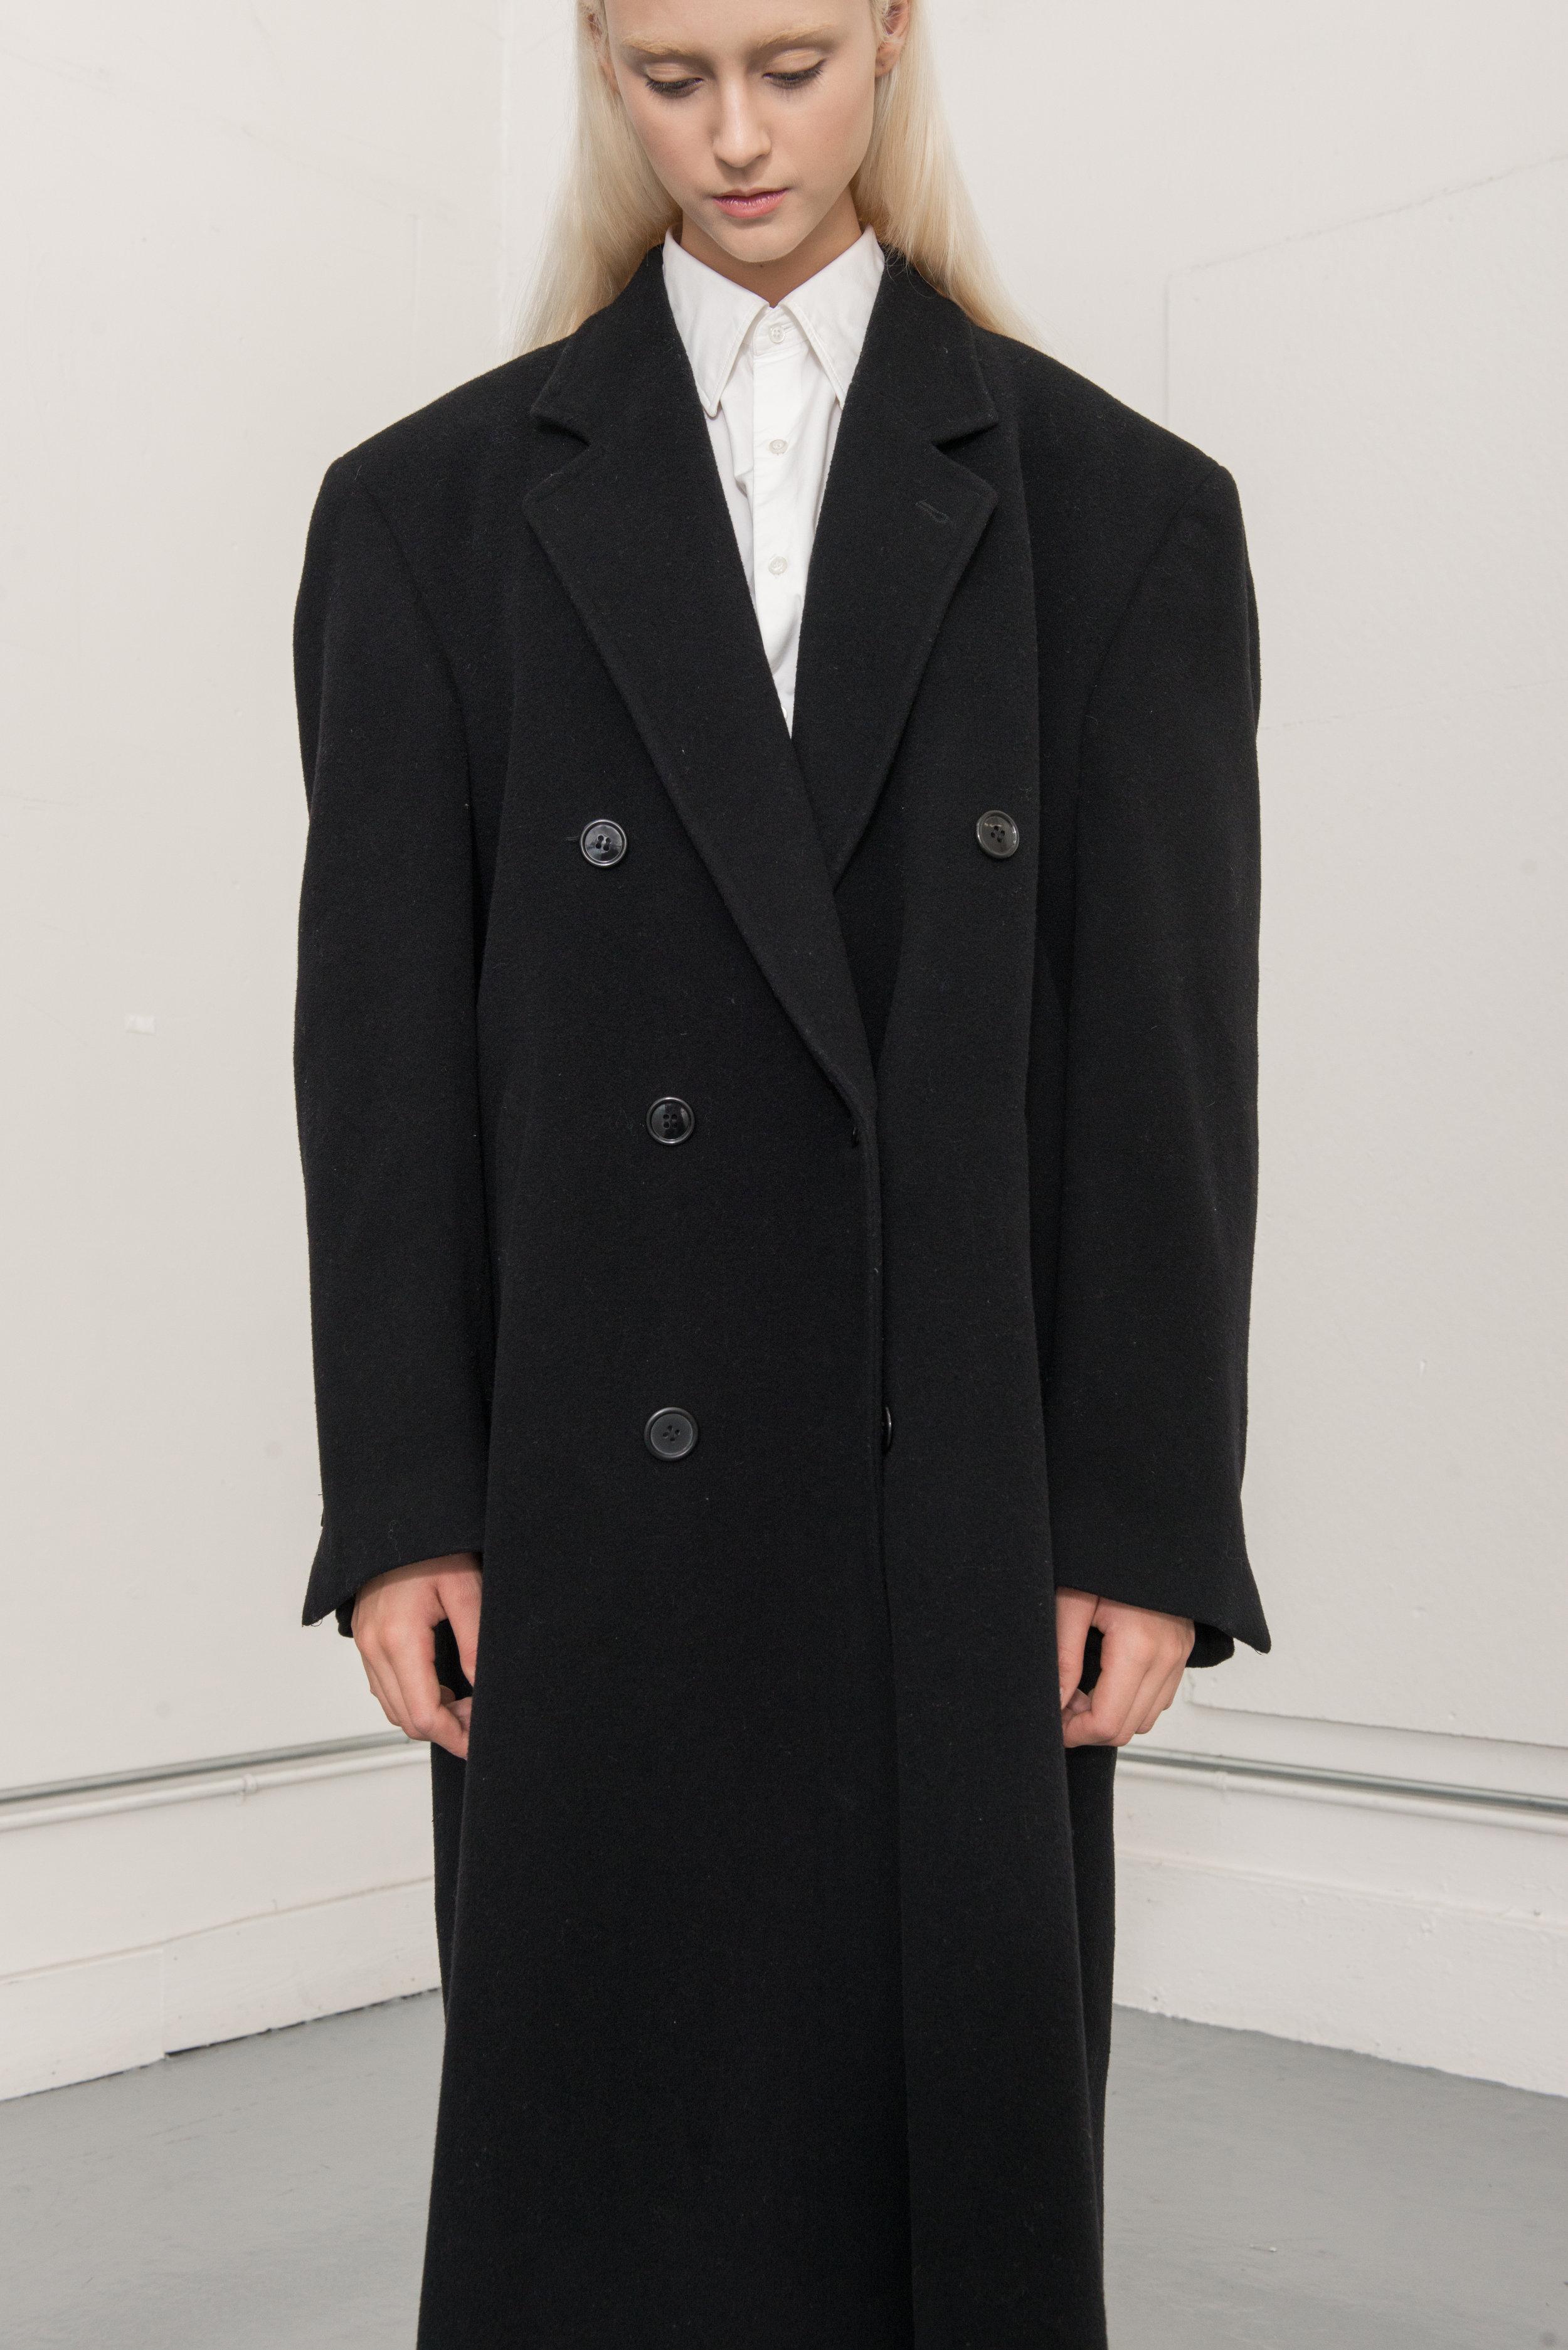 jacket CHRISTIAN AUHARD, shirt N.HOOLYWOOD, pants, VINCE, shoes DR MARTENS, stocking WEST LOOP